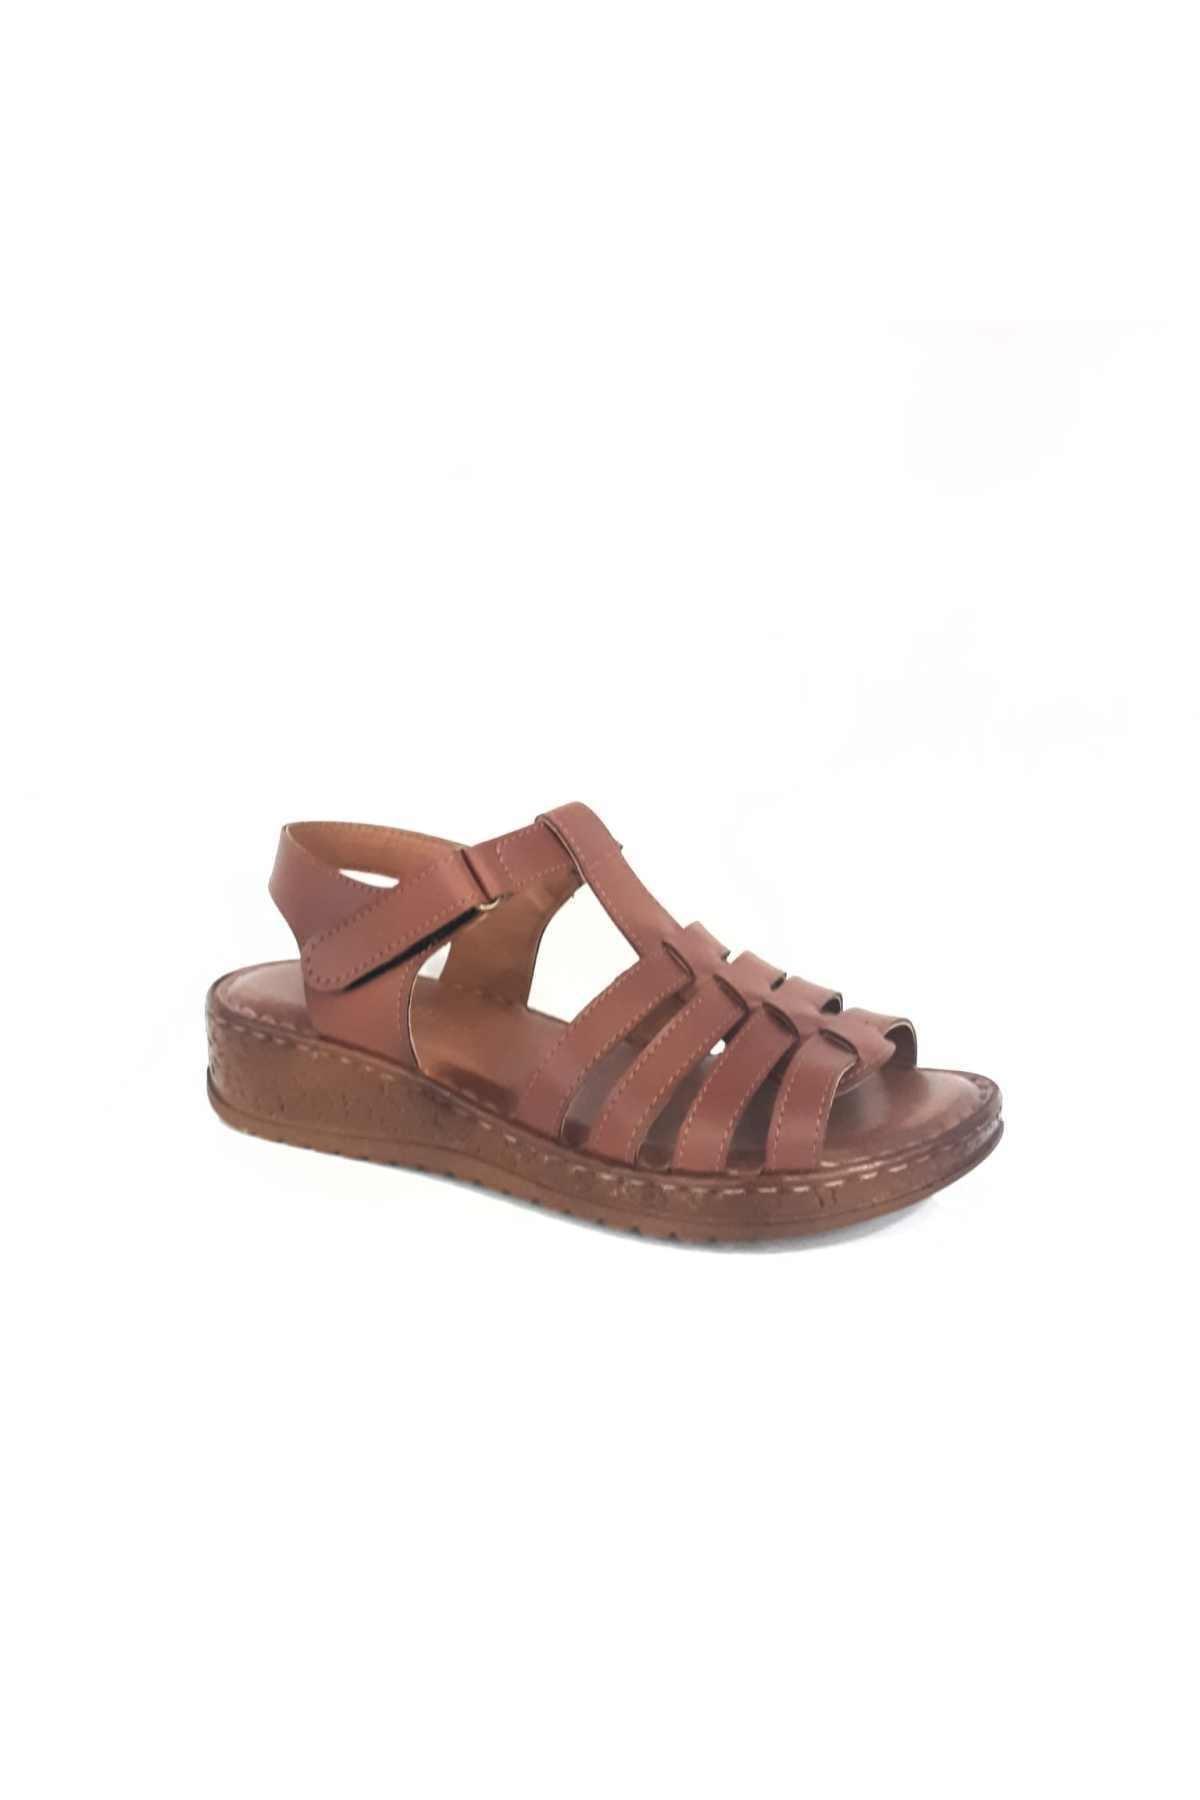 Merry Pace Kadın Kahverengi Dolgu Topuk Sandalet 1